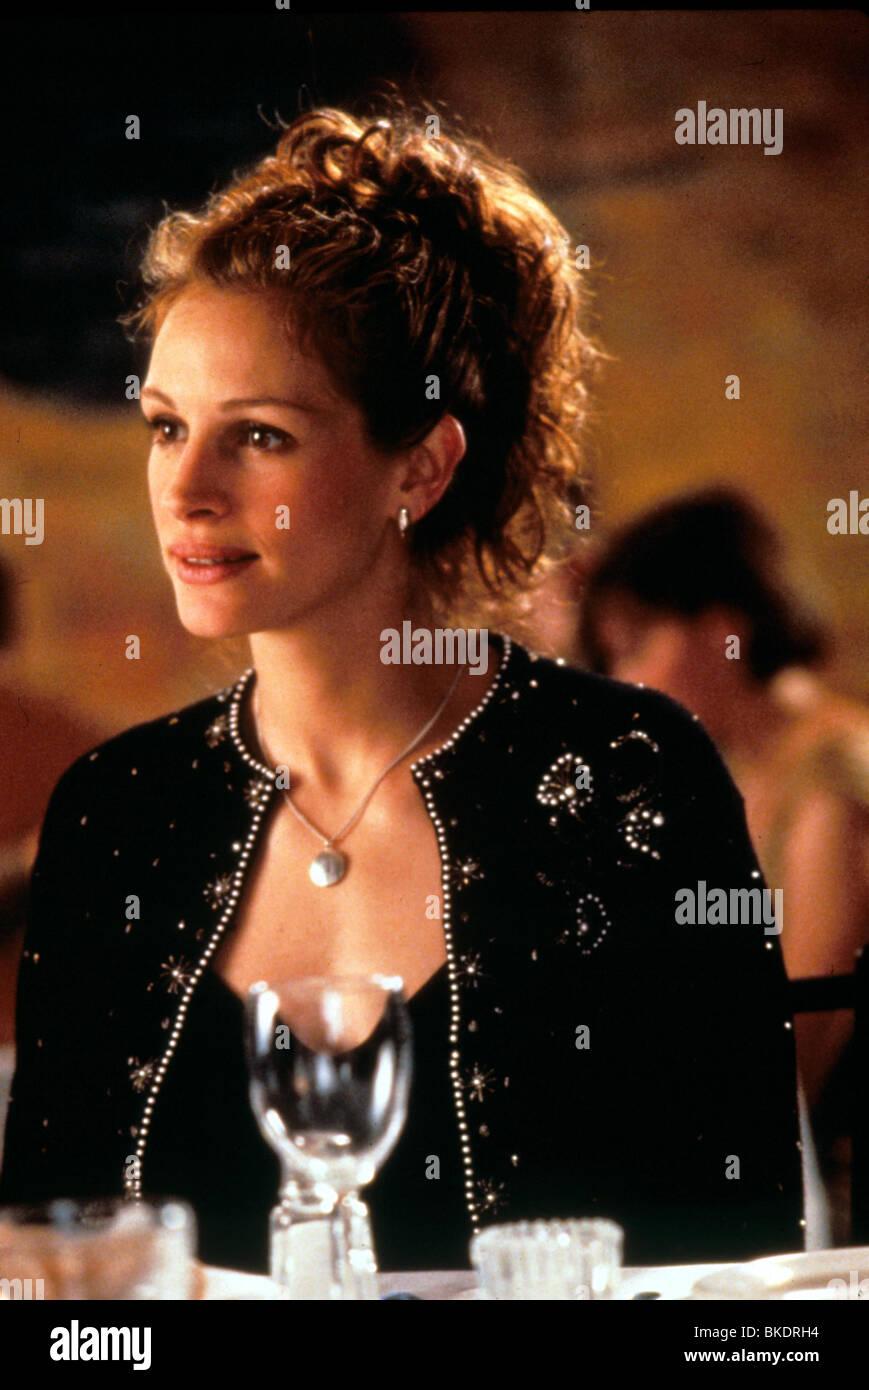 My Best Friend S Wedding 1997 Julia Roberts Mbfw 046 Stock Photo Alamy